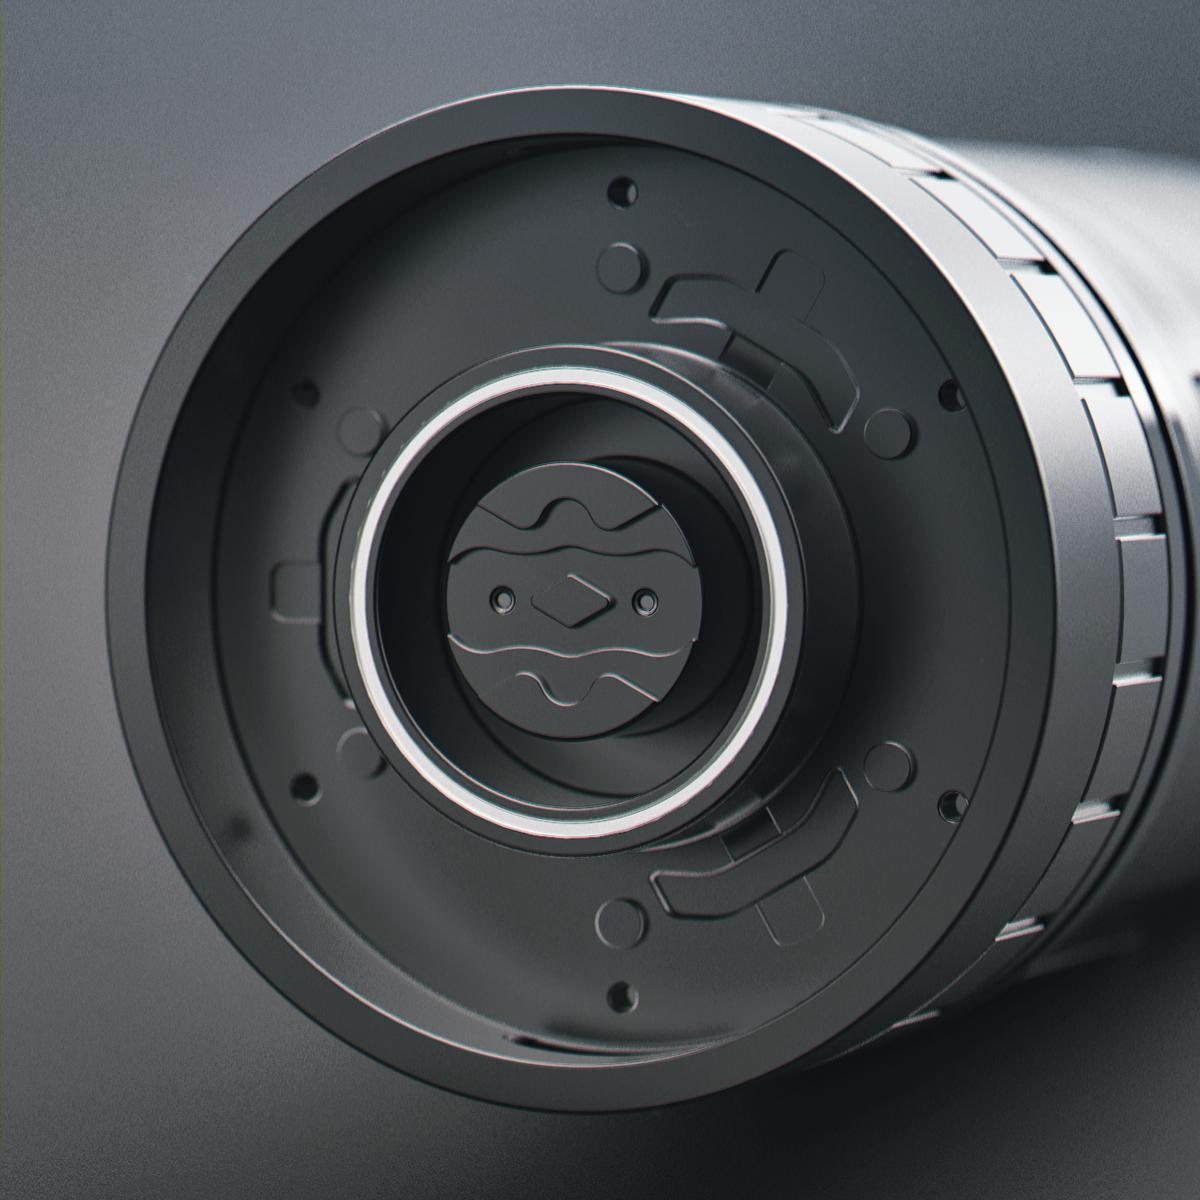 hard surface cad machine Sci Fi tech futuristic Render fusion